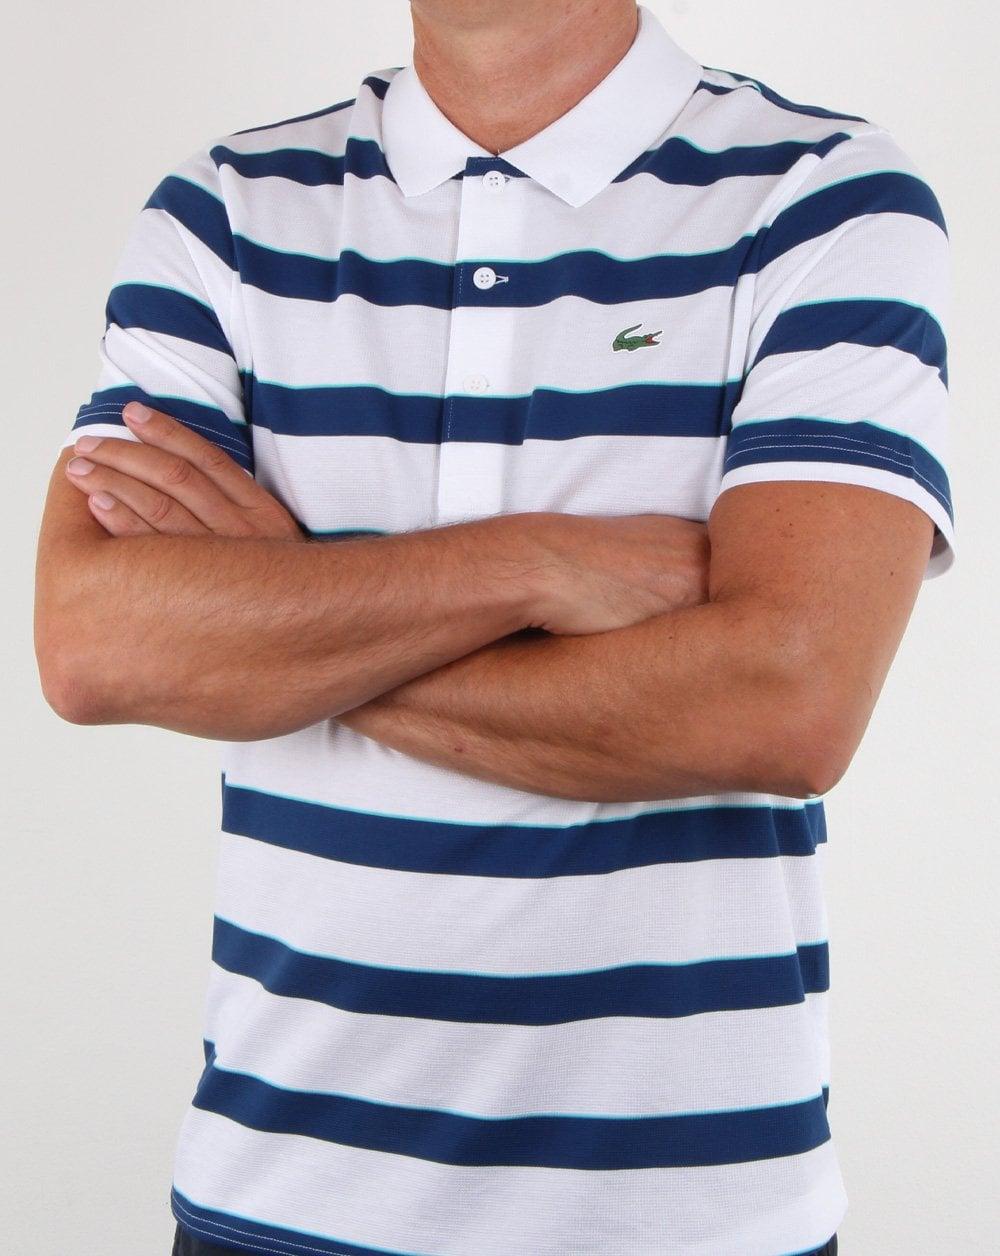 Lacoste Striped Polo Shirt White/Blue, Mems, Polo, Cotton ...